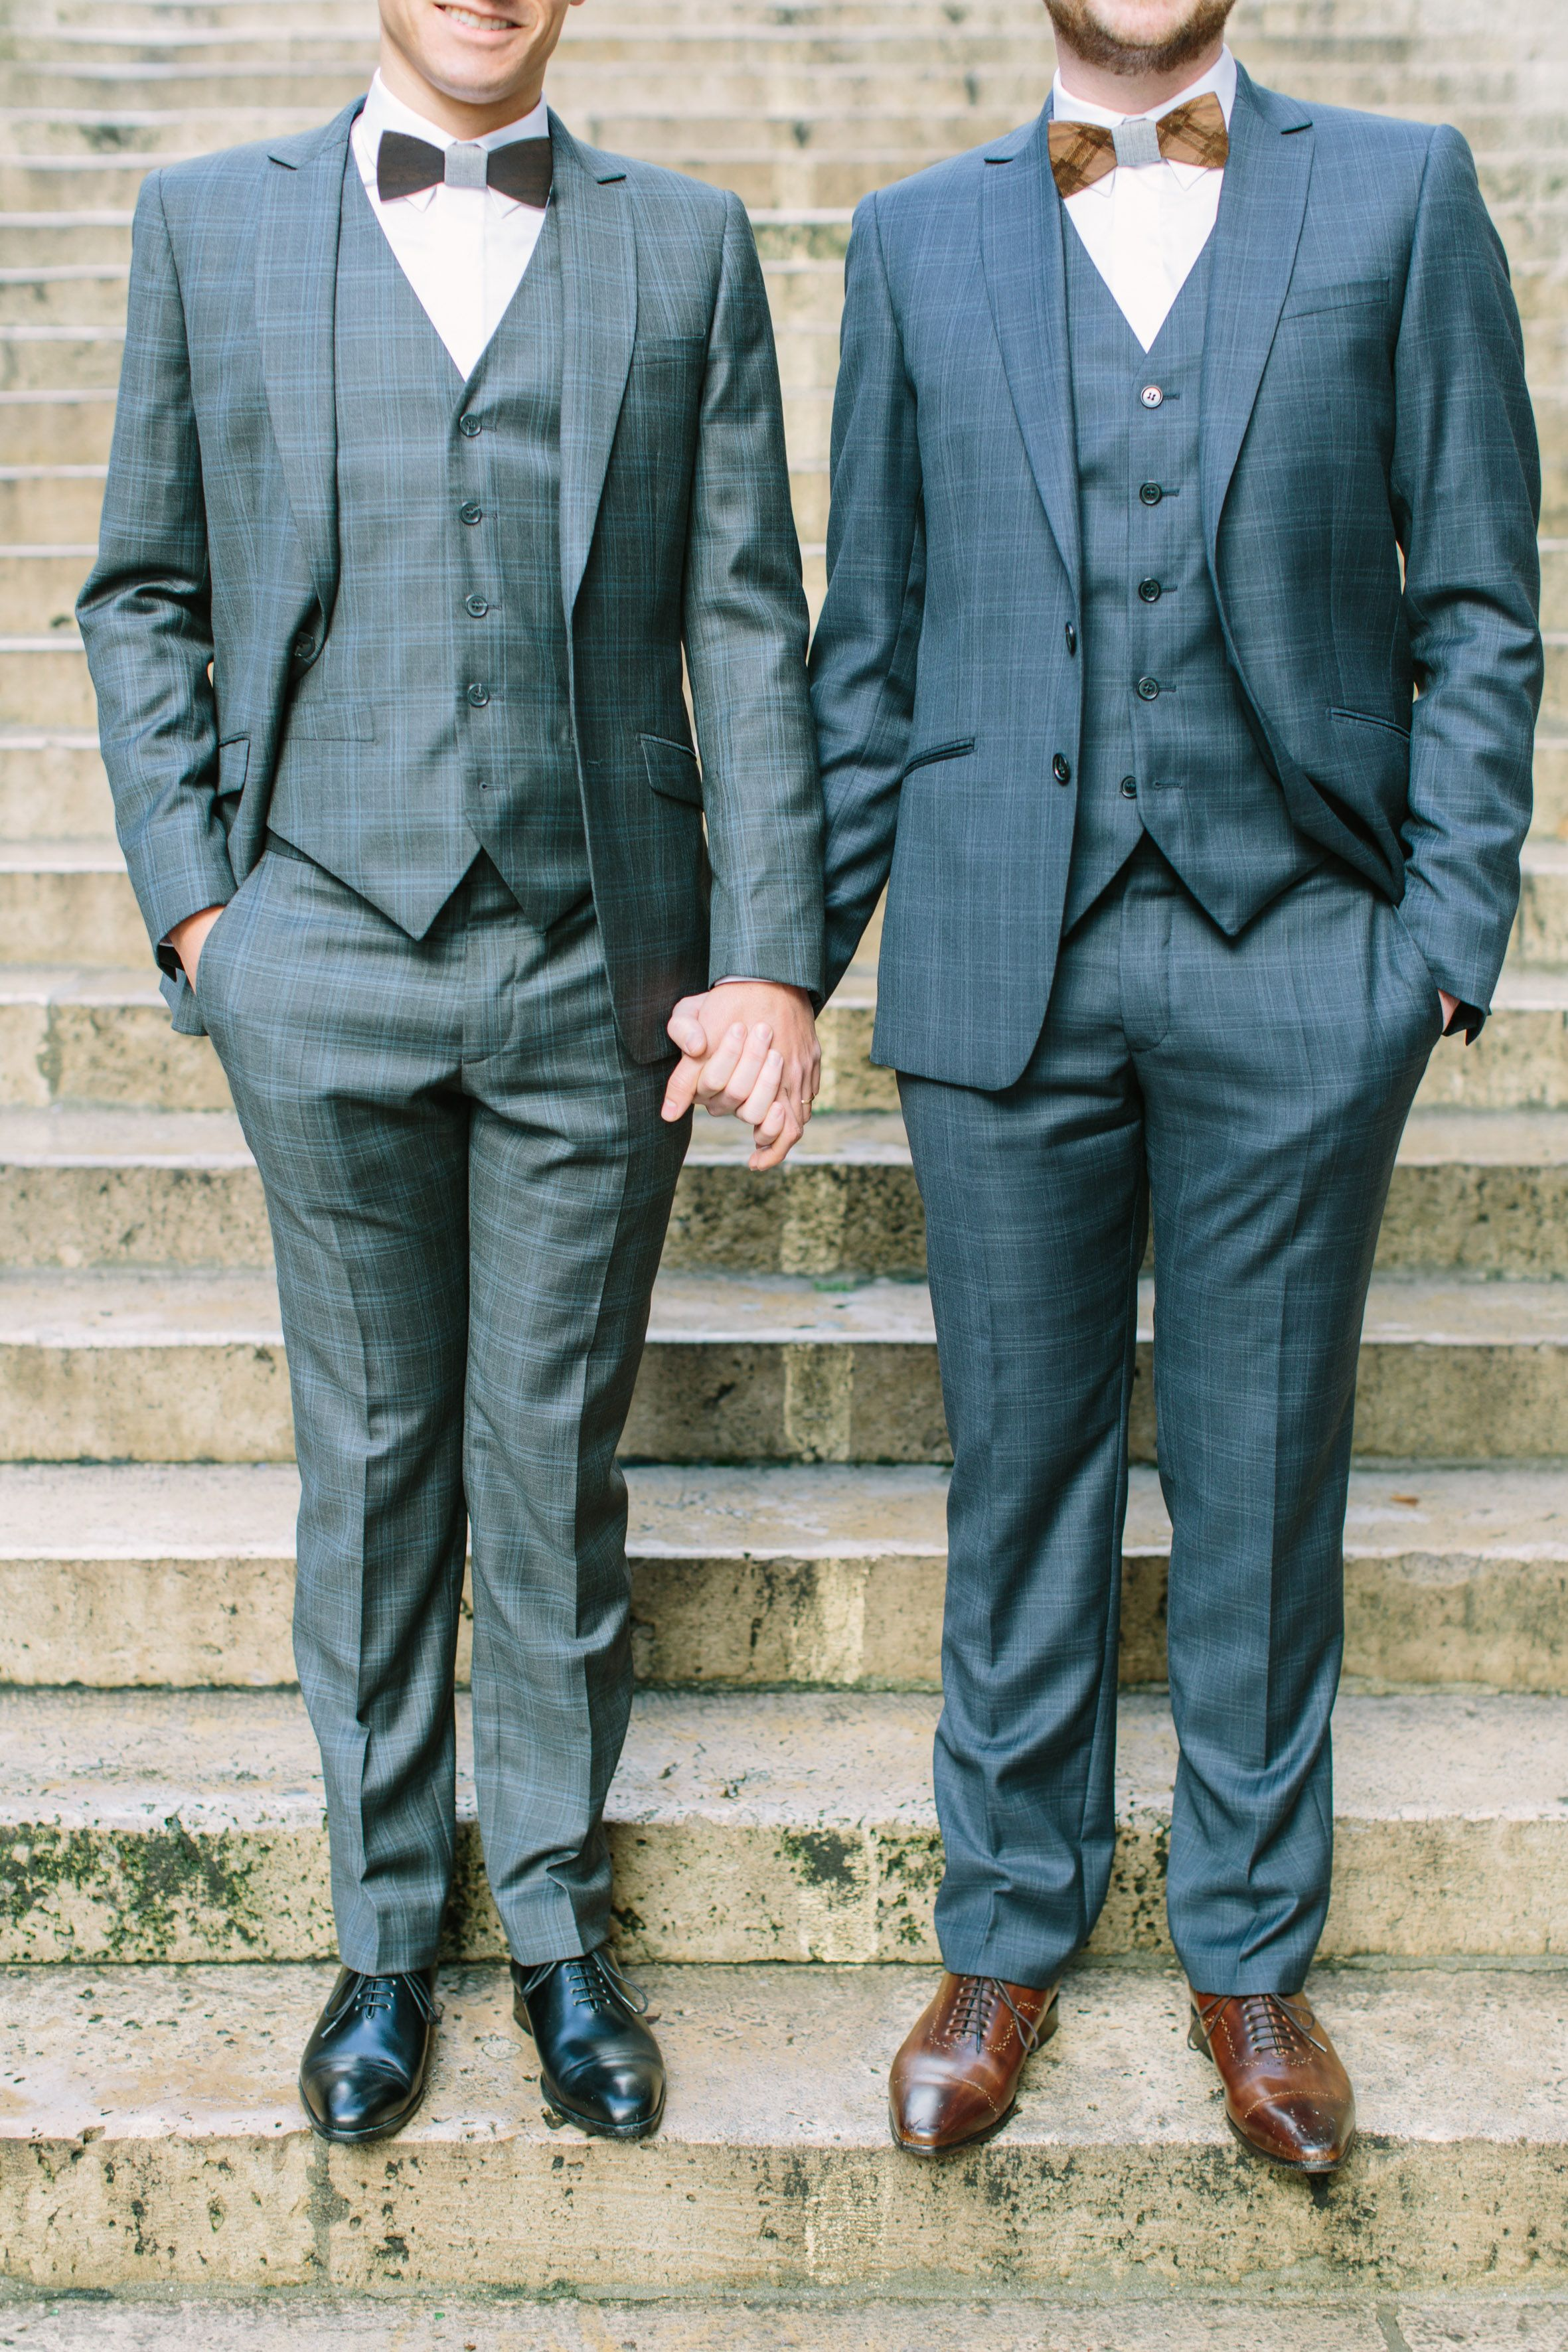 C&N Wedding @Oliver Fly www.oliverfly.com/ | sona | Pinterest ...